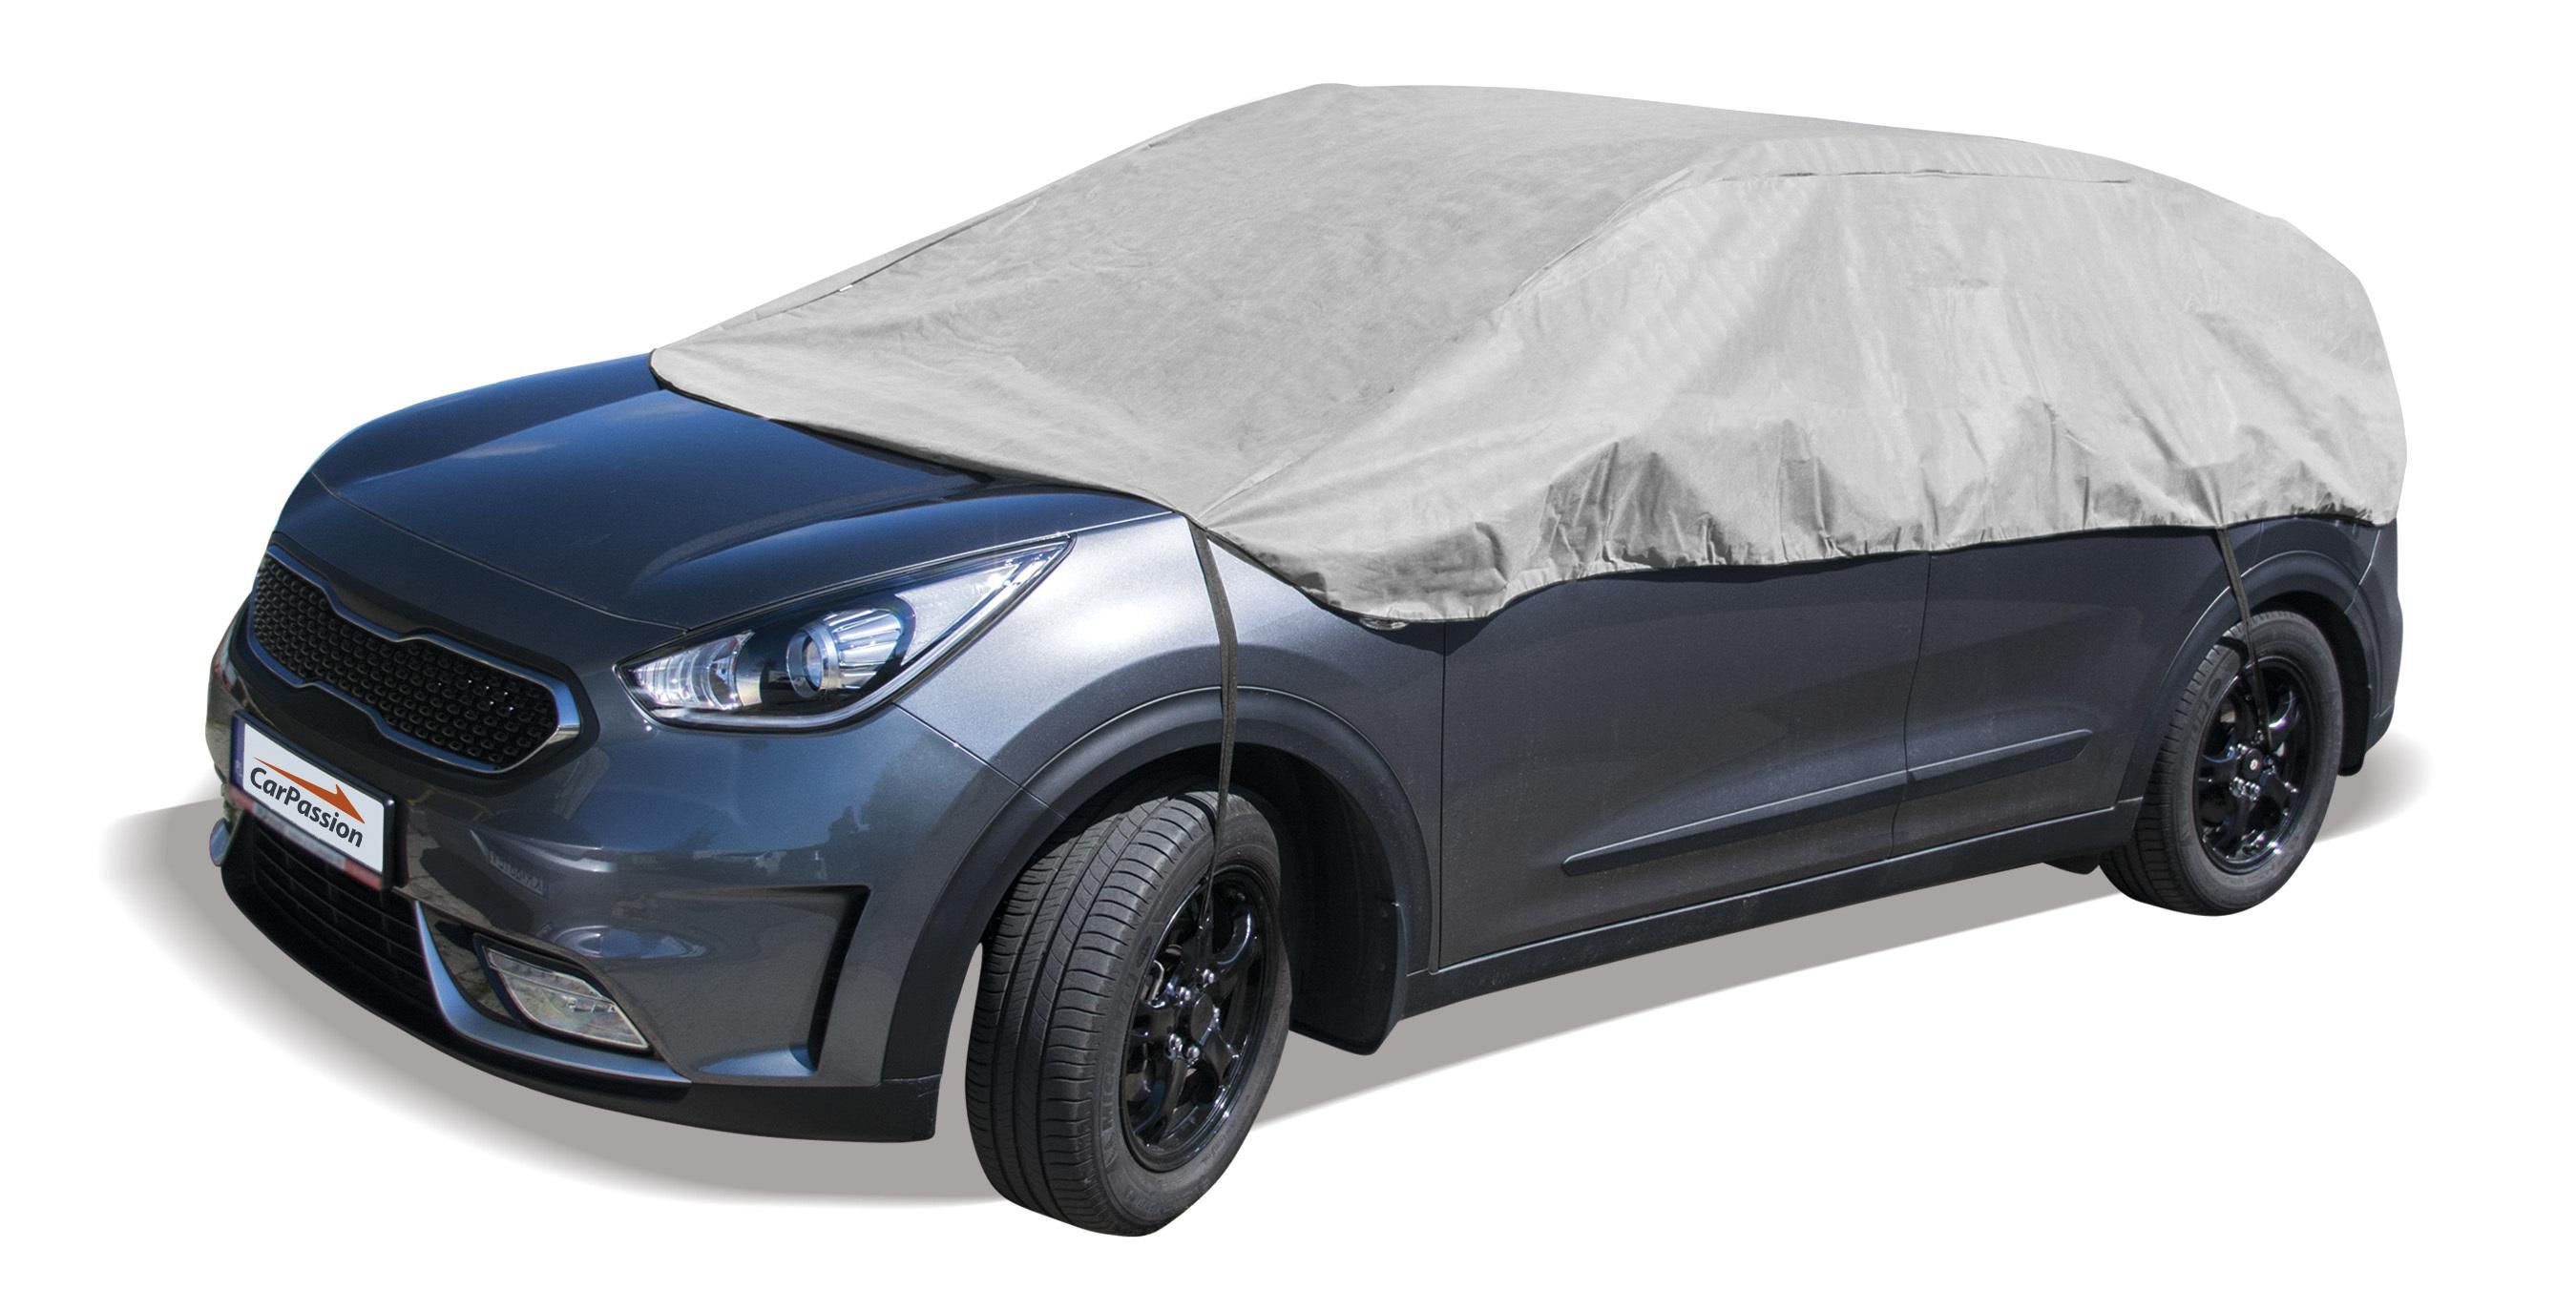 Покривало за кола CARPASSION 10015 оценка